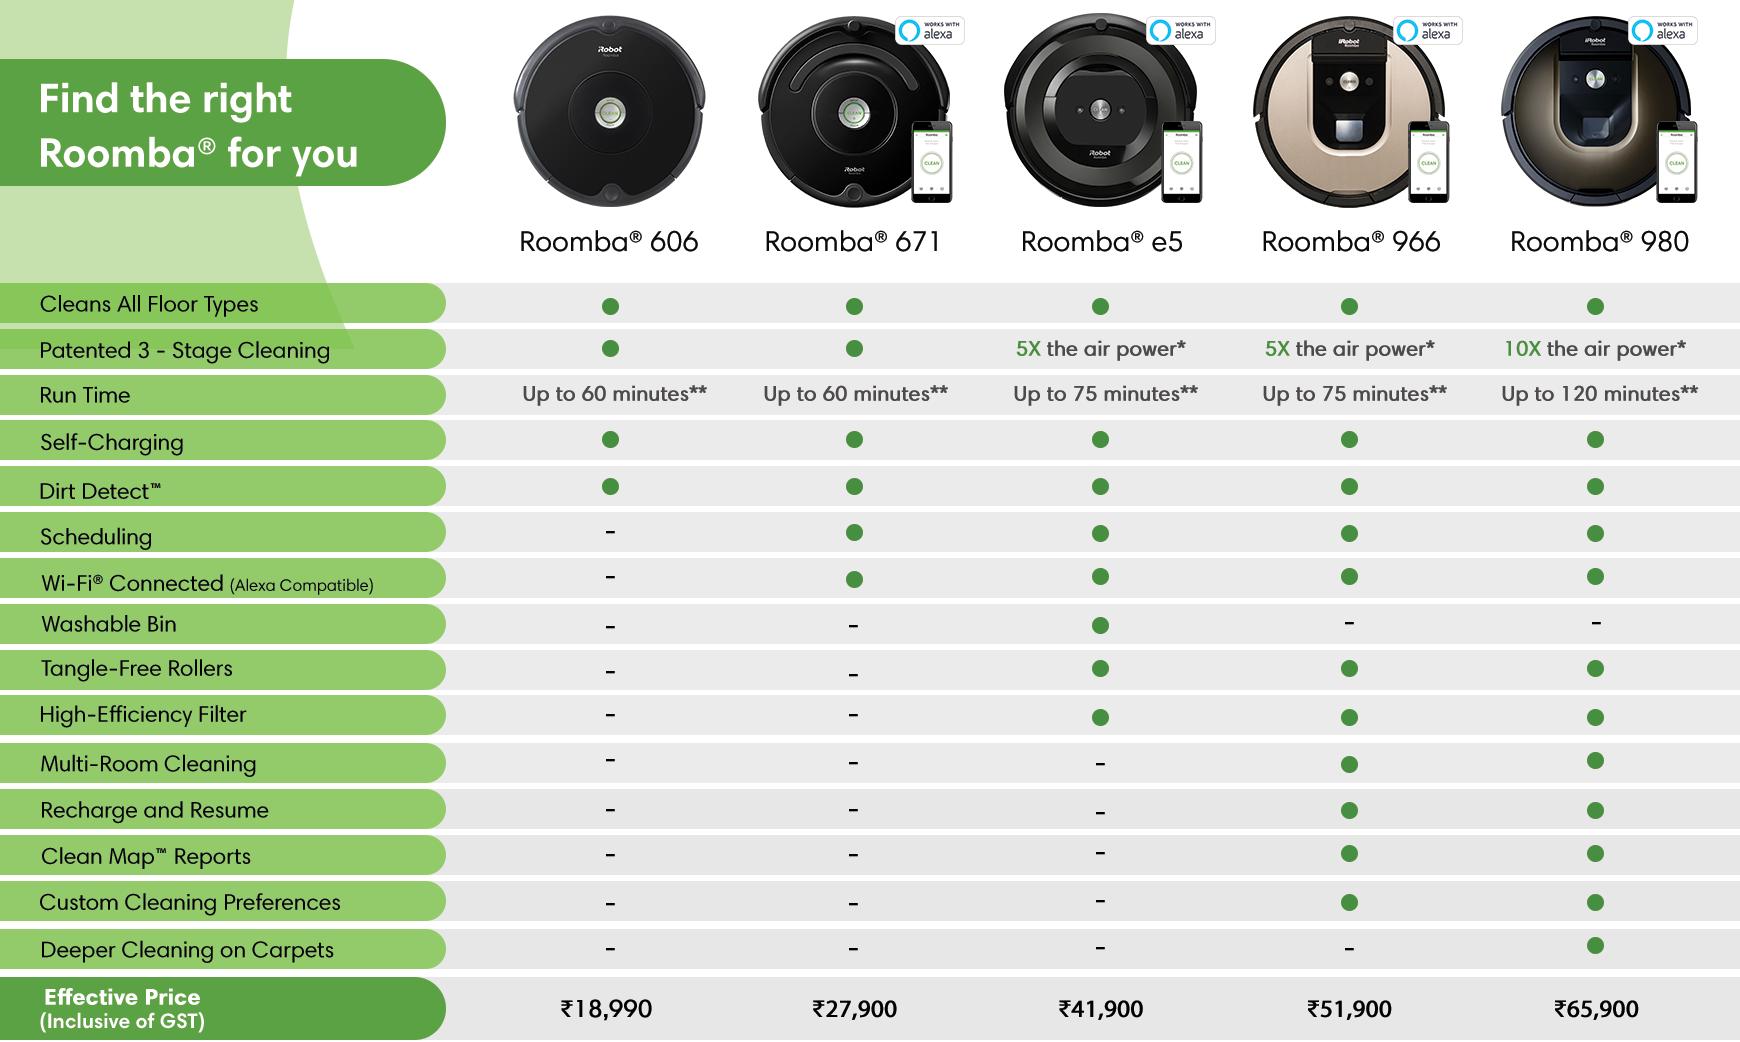 iRobot Roomba and Braava Smart Cleaning Robots